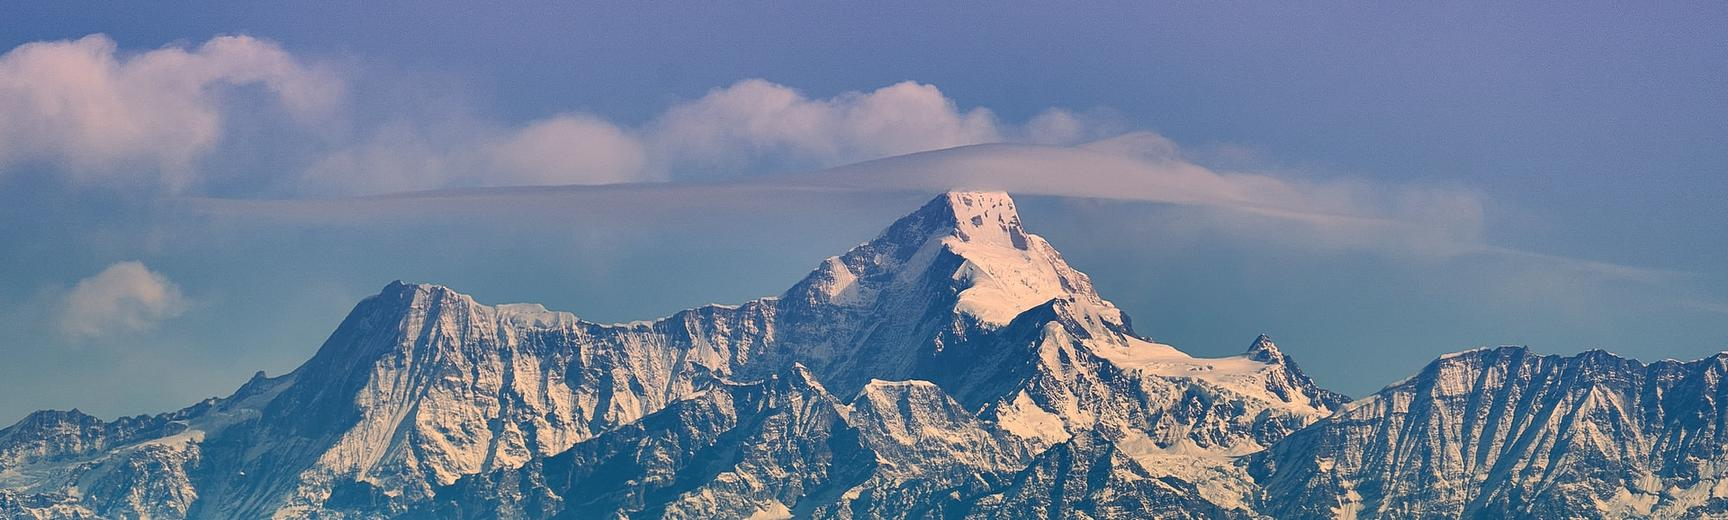 himalay mountain view